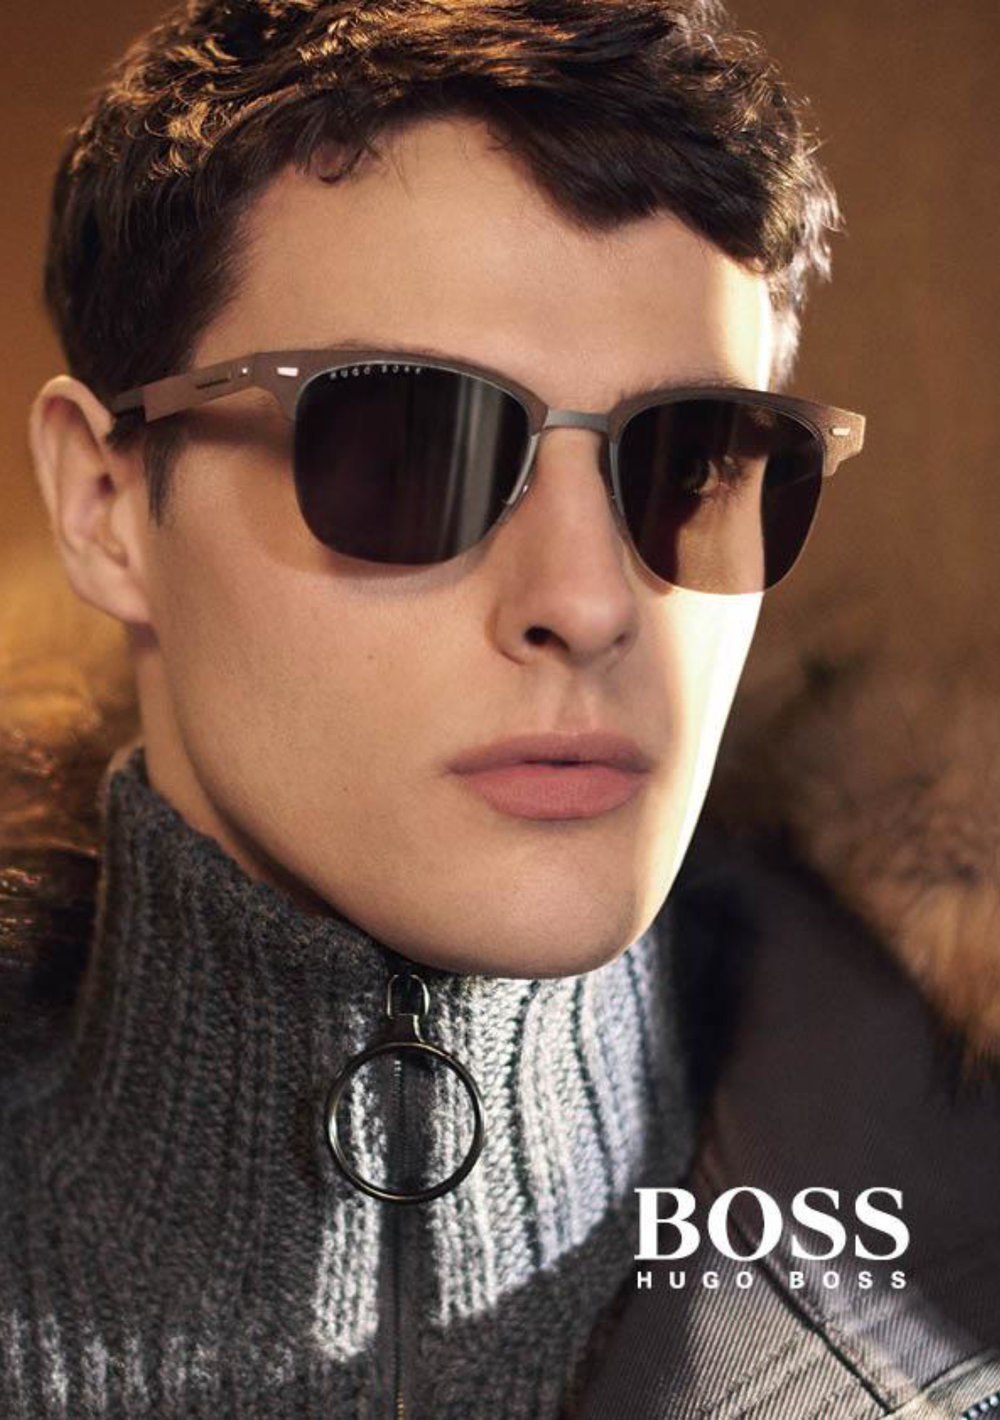 hugo-boss_eyewear_advert.jpg